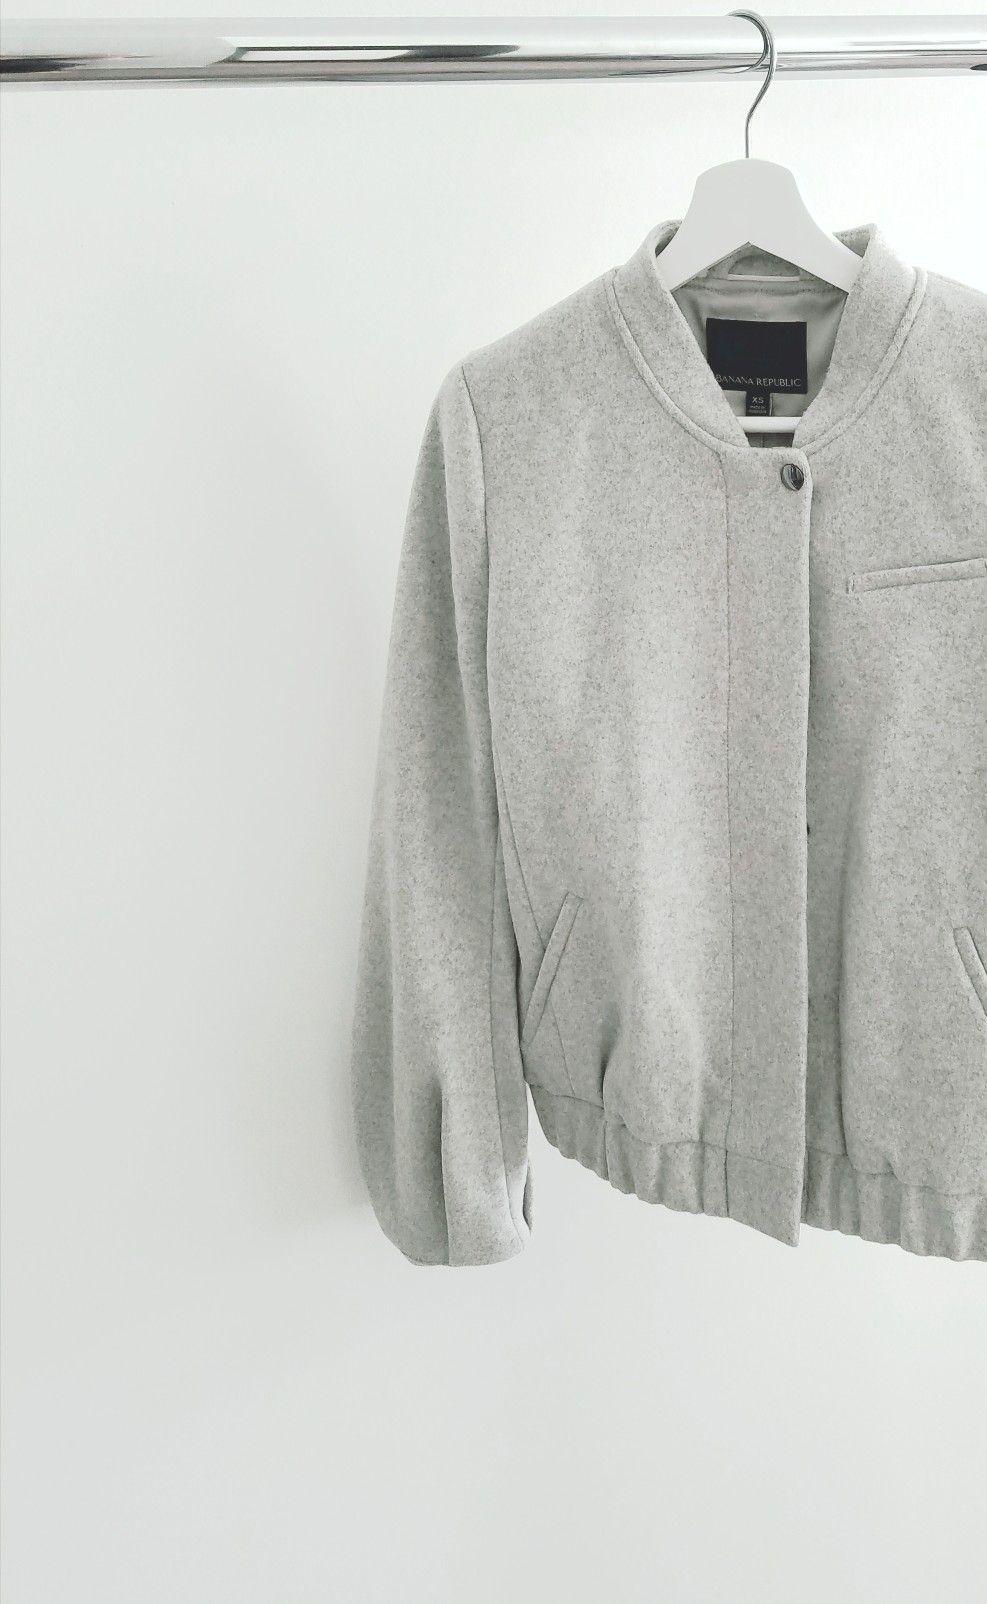 W_Haute_Chic bananarepublicbomberjacket Men sweater